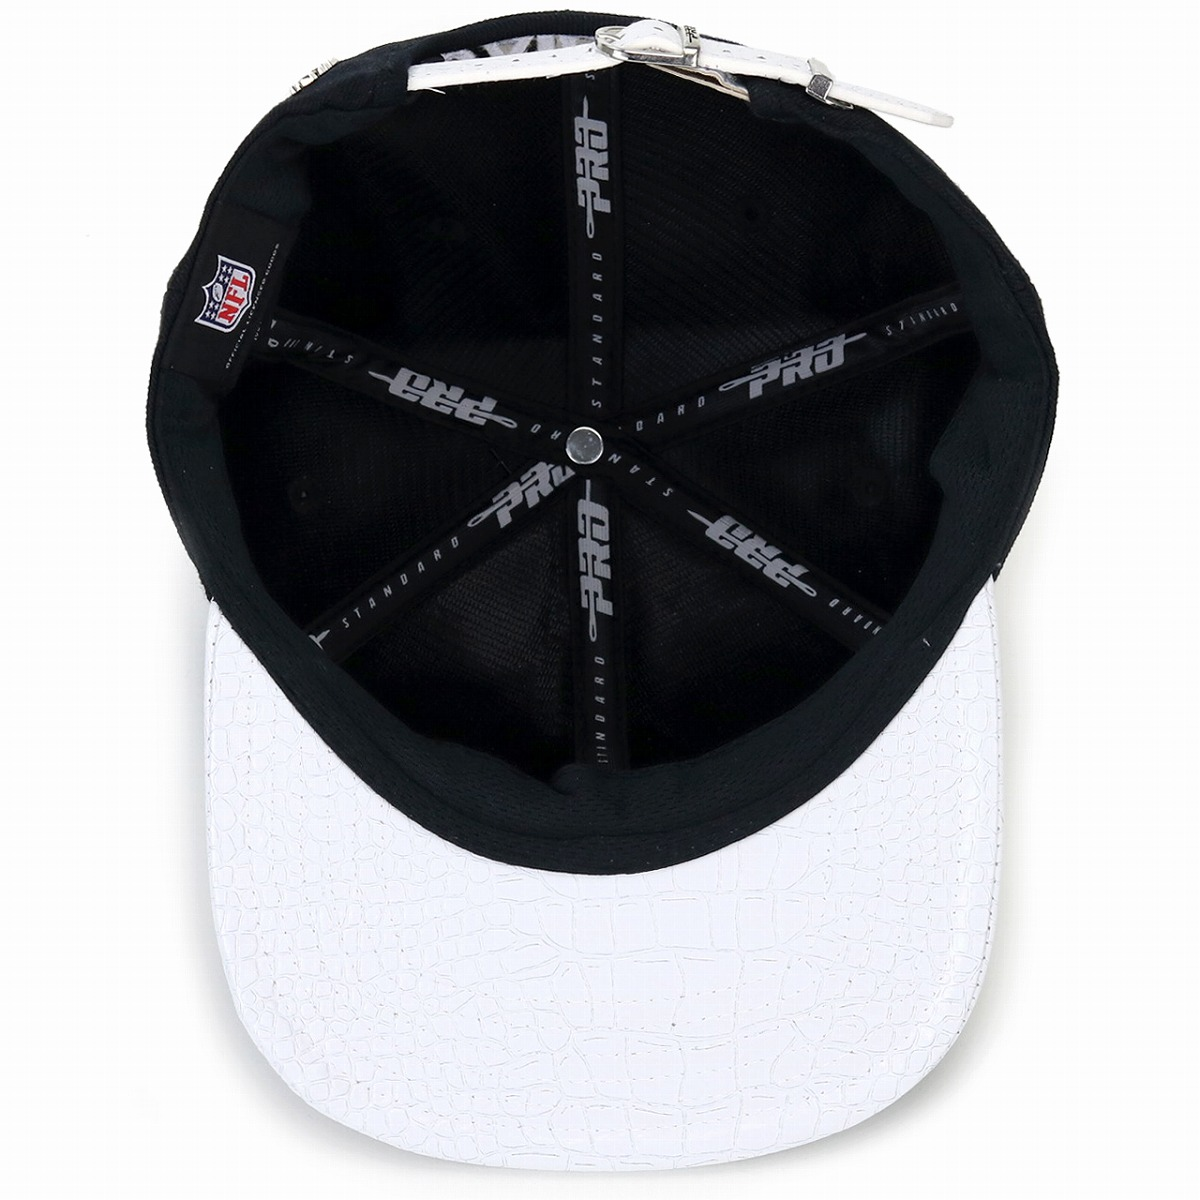 dd33d801a Professional standard NFL logo cap Oakland Raiders logo men gap Dis hat Pro  Standard Oakland Raiders black / white [baseball cap]